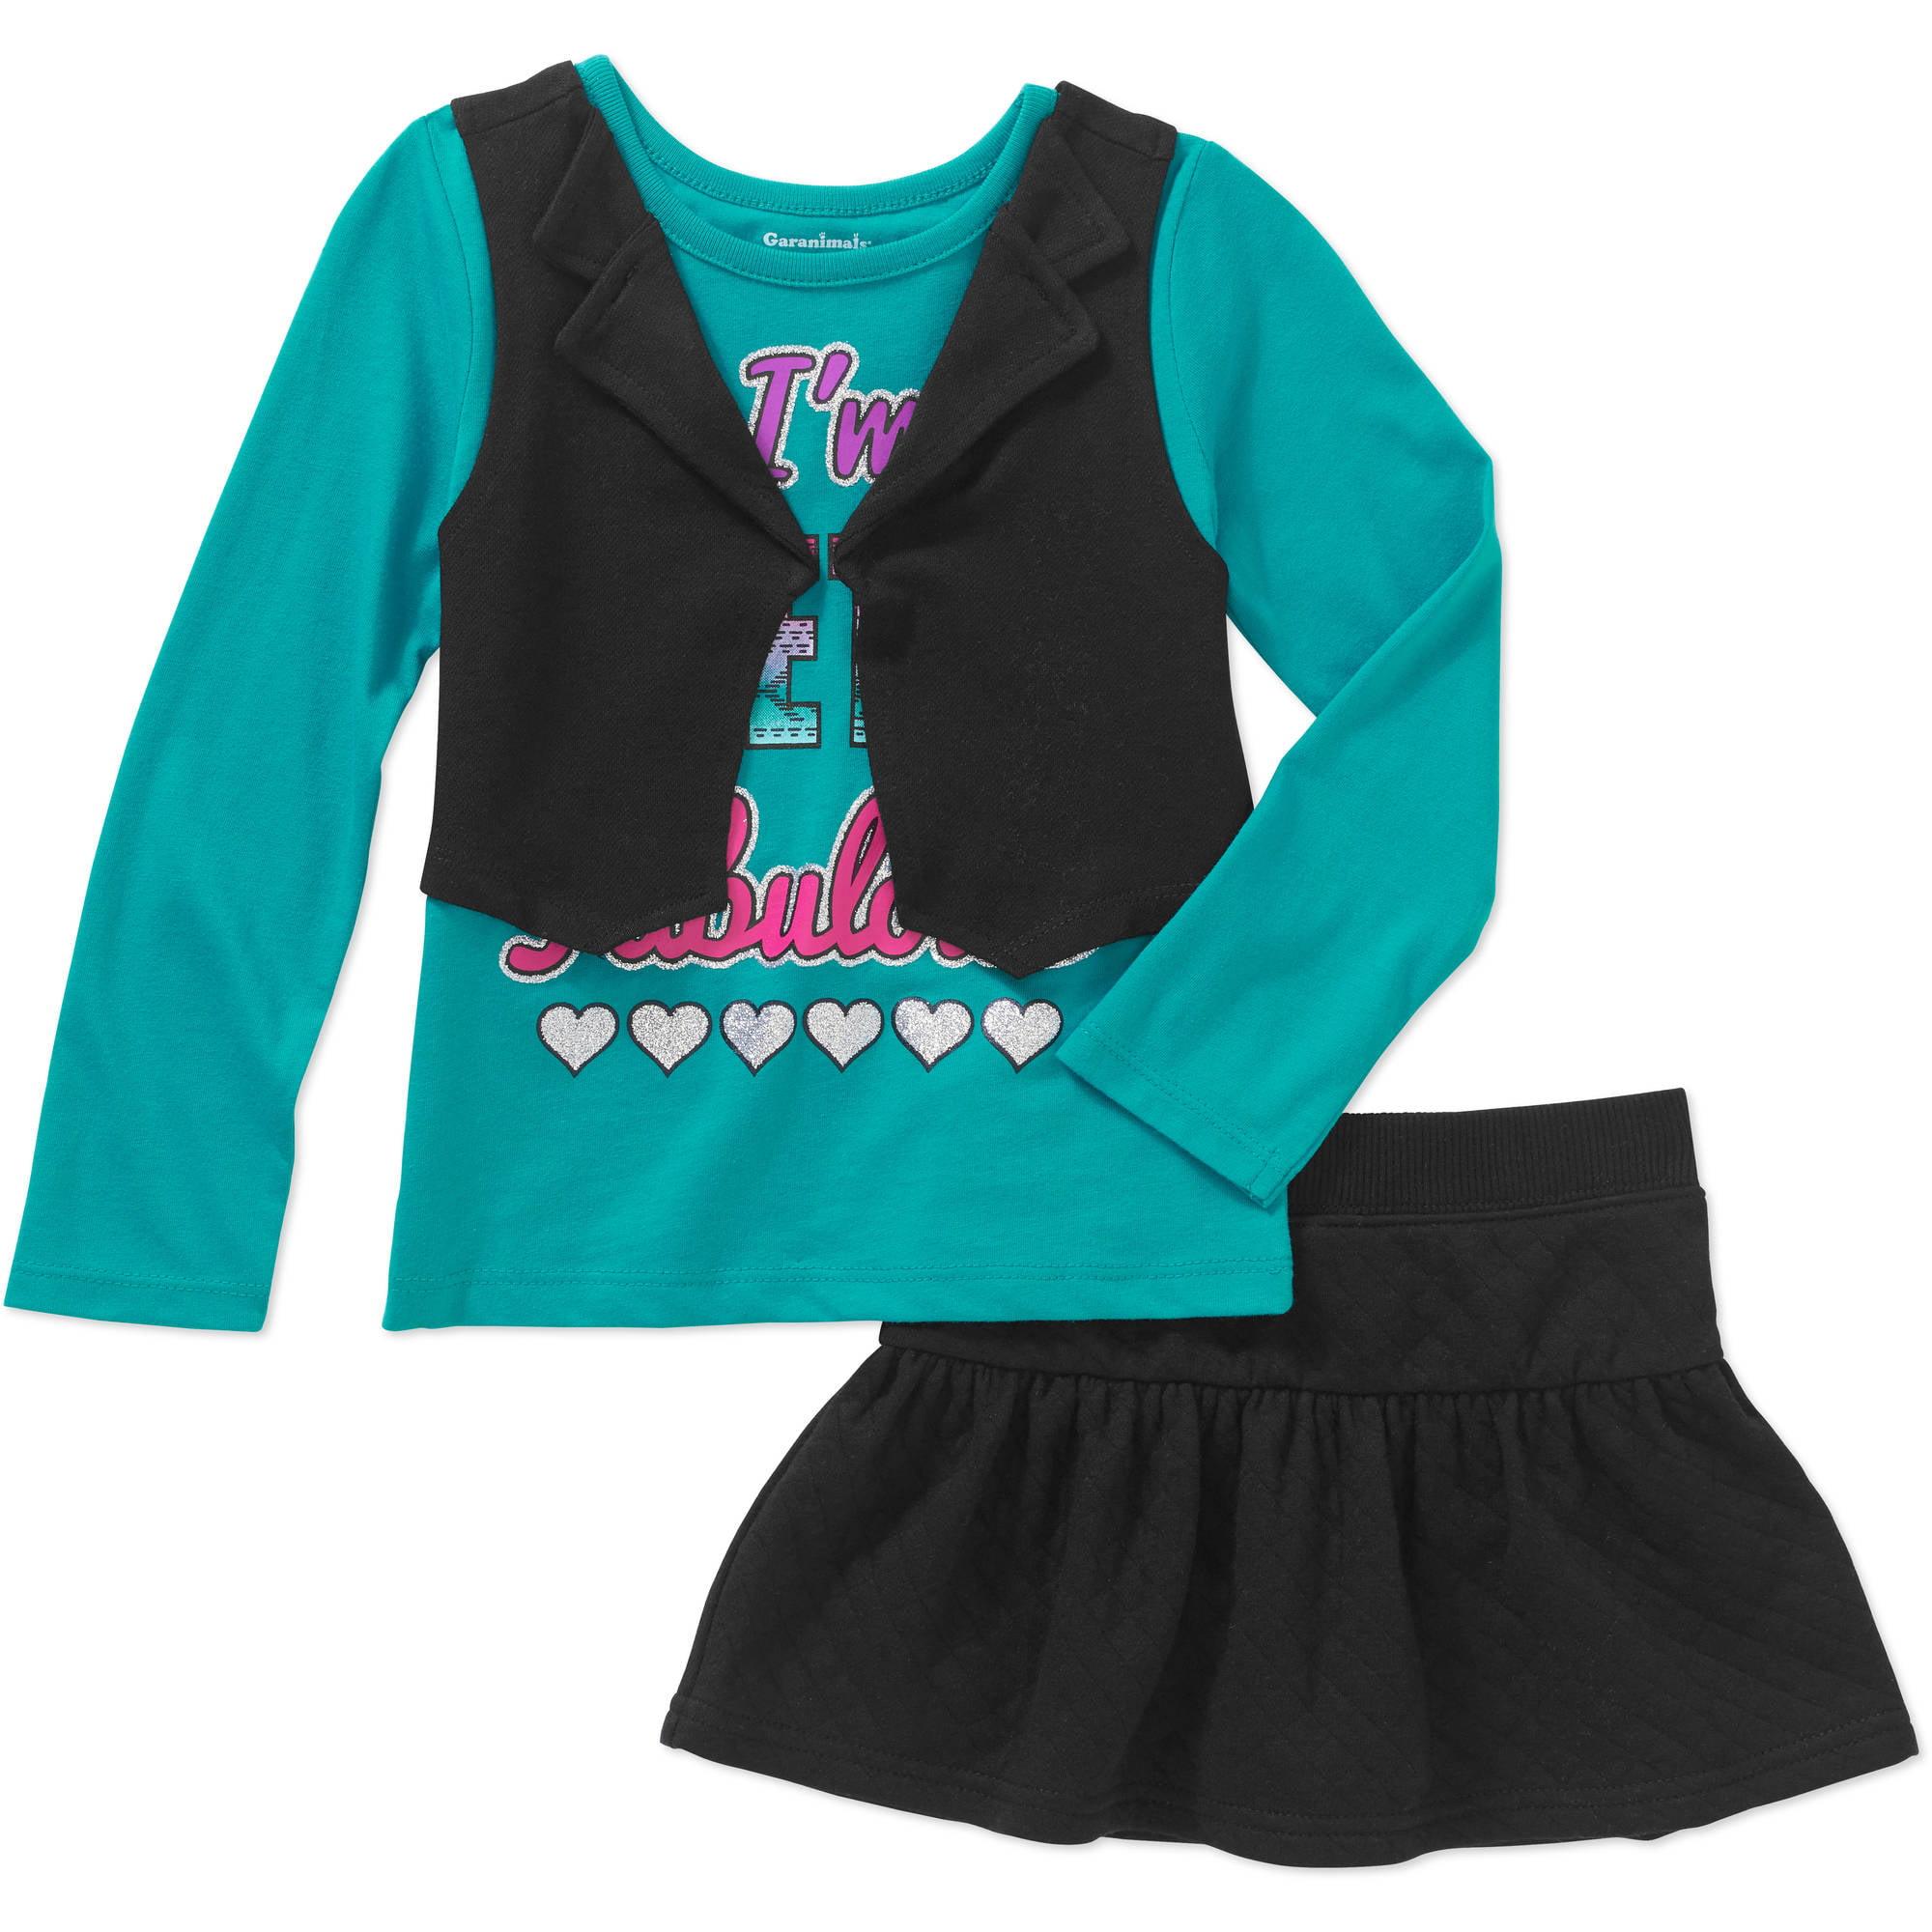 Garanimals Baby Toddler Girl 2 Pc Long Sleeve Tee w/ Vest & Quilted Skort Set